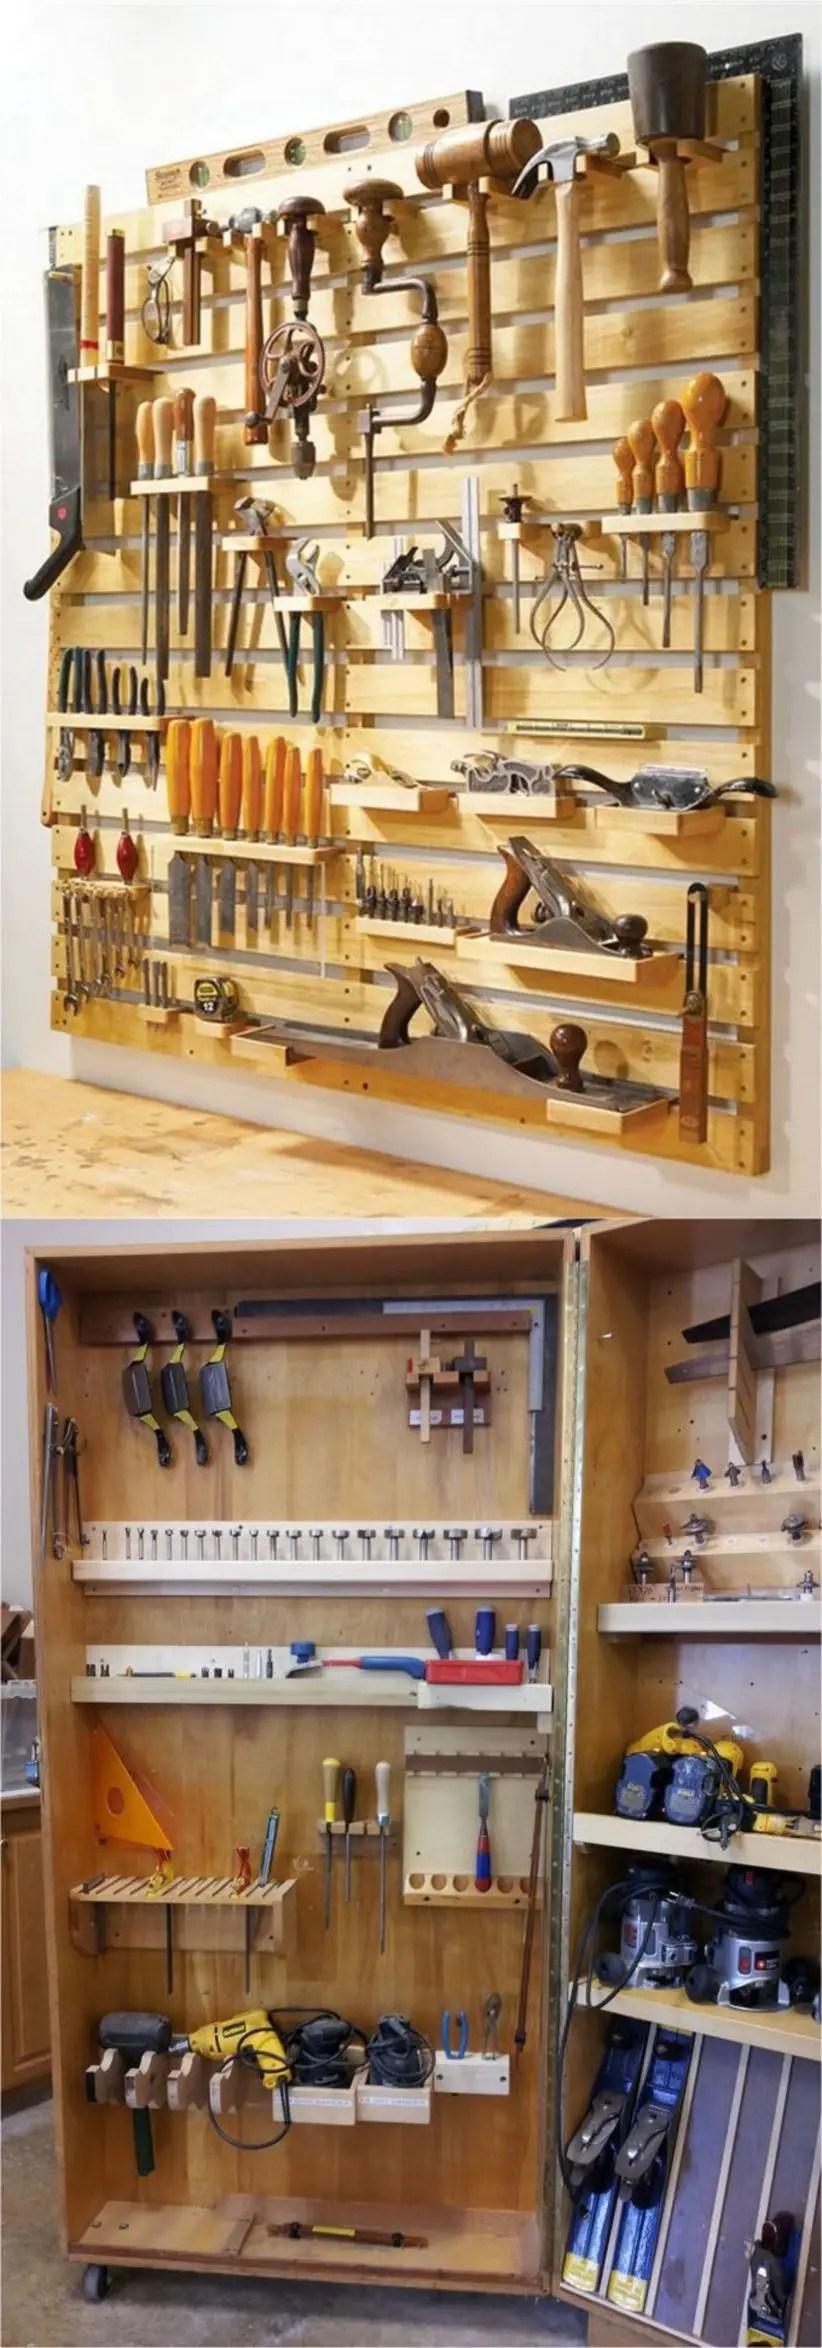 Creative hacks to organize your stuff for garage storage 08